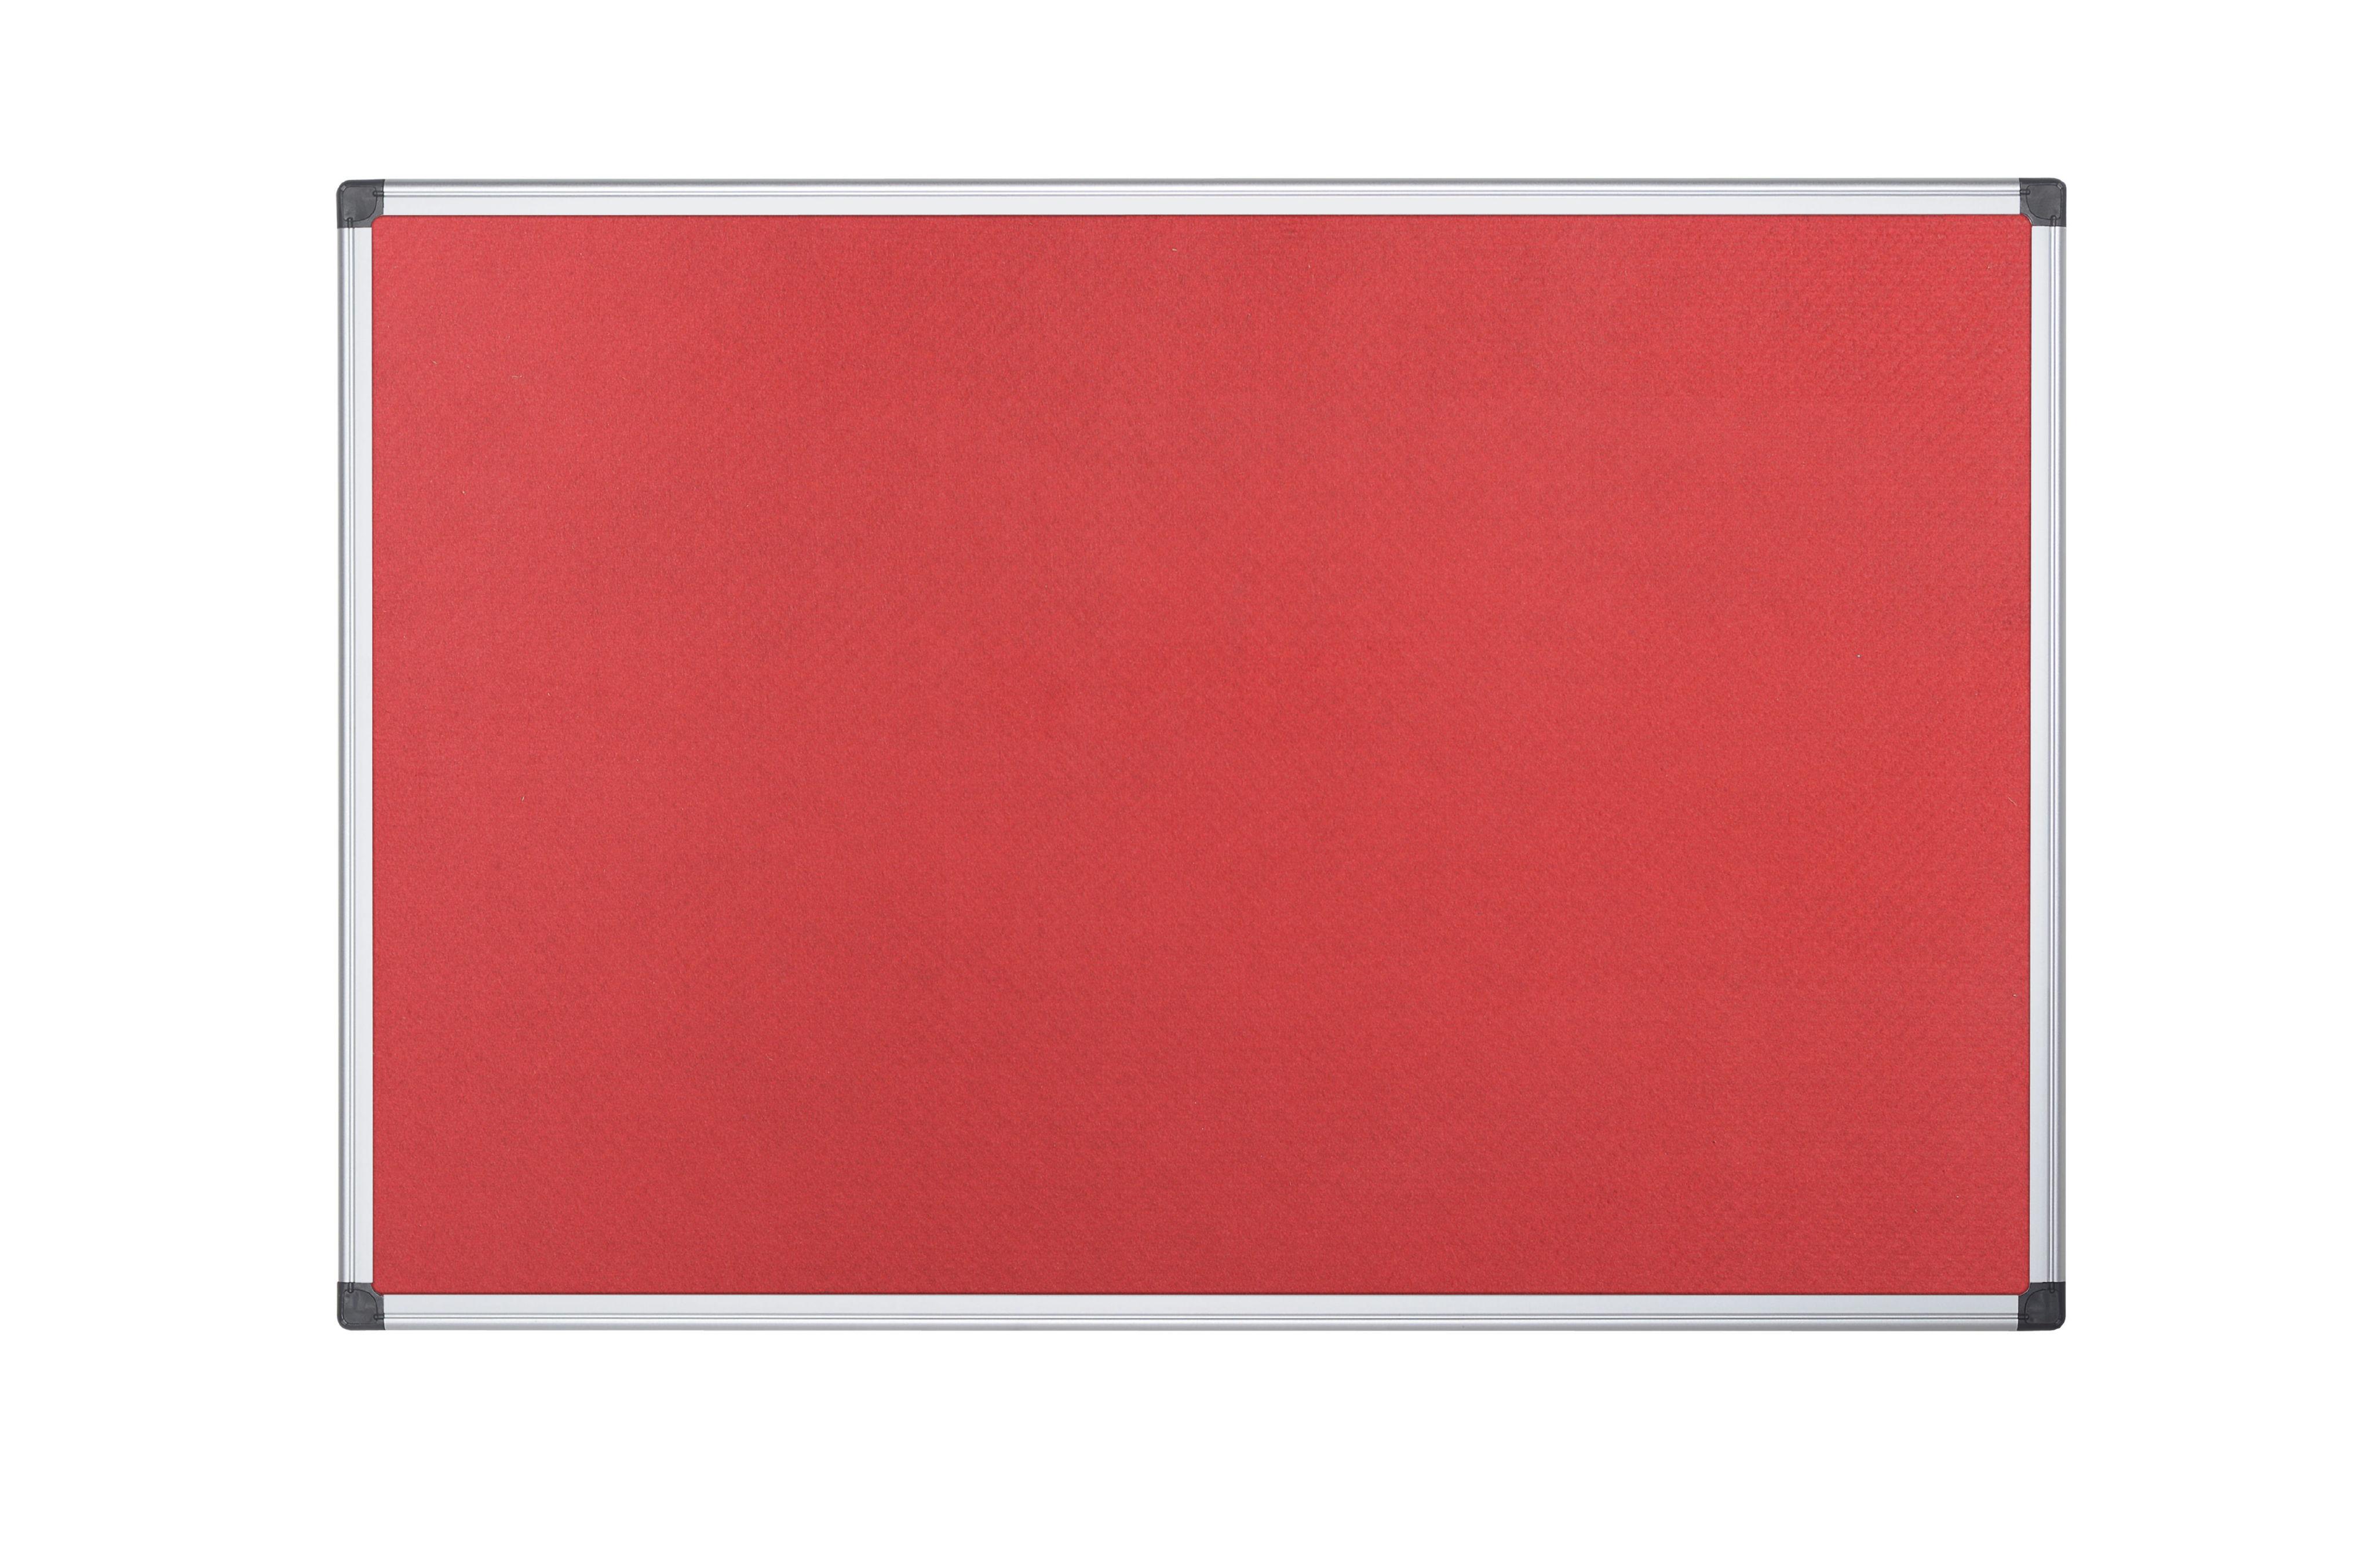 Felt Bi-Office Maya Red Felt Noticeboard Aluminium Frame 1800x1200mm